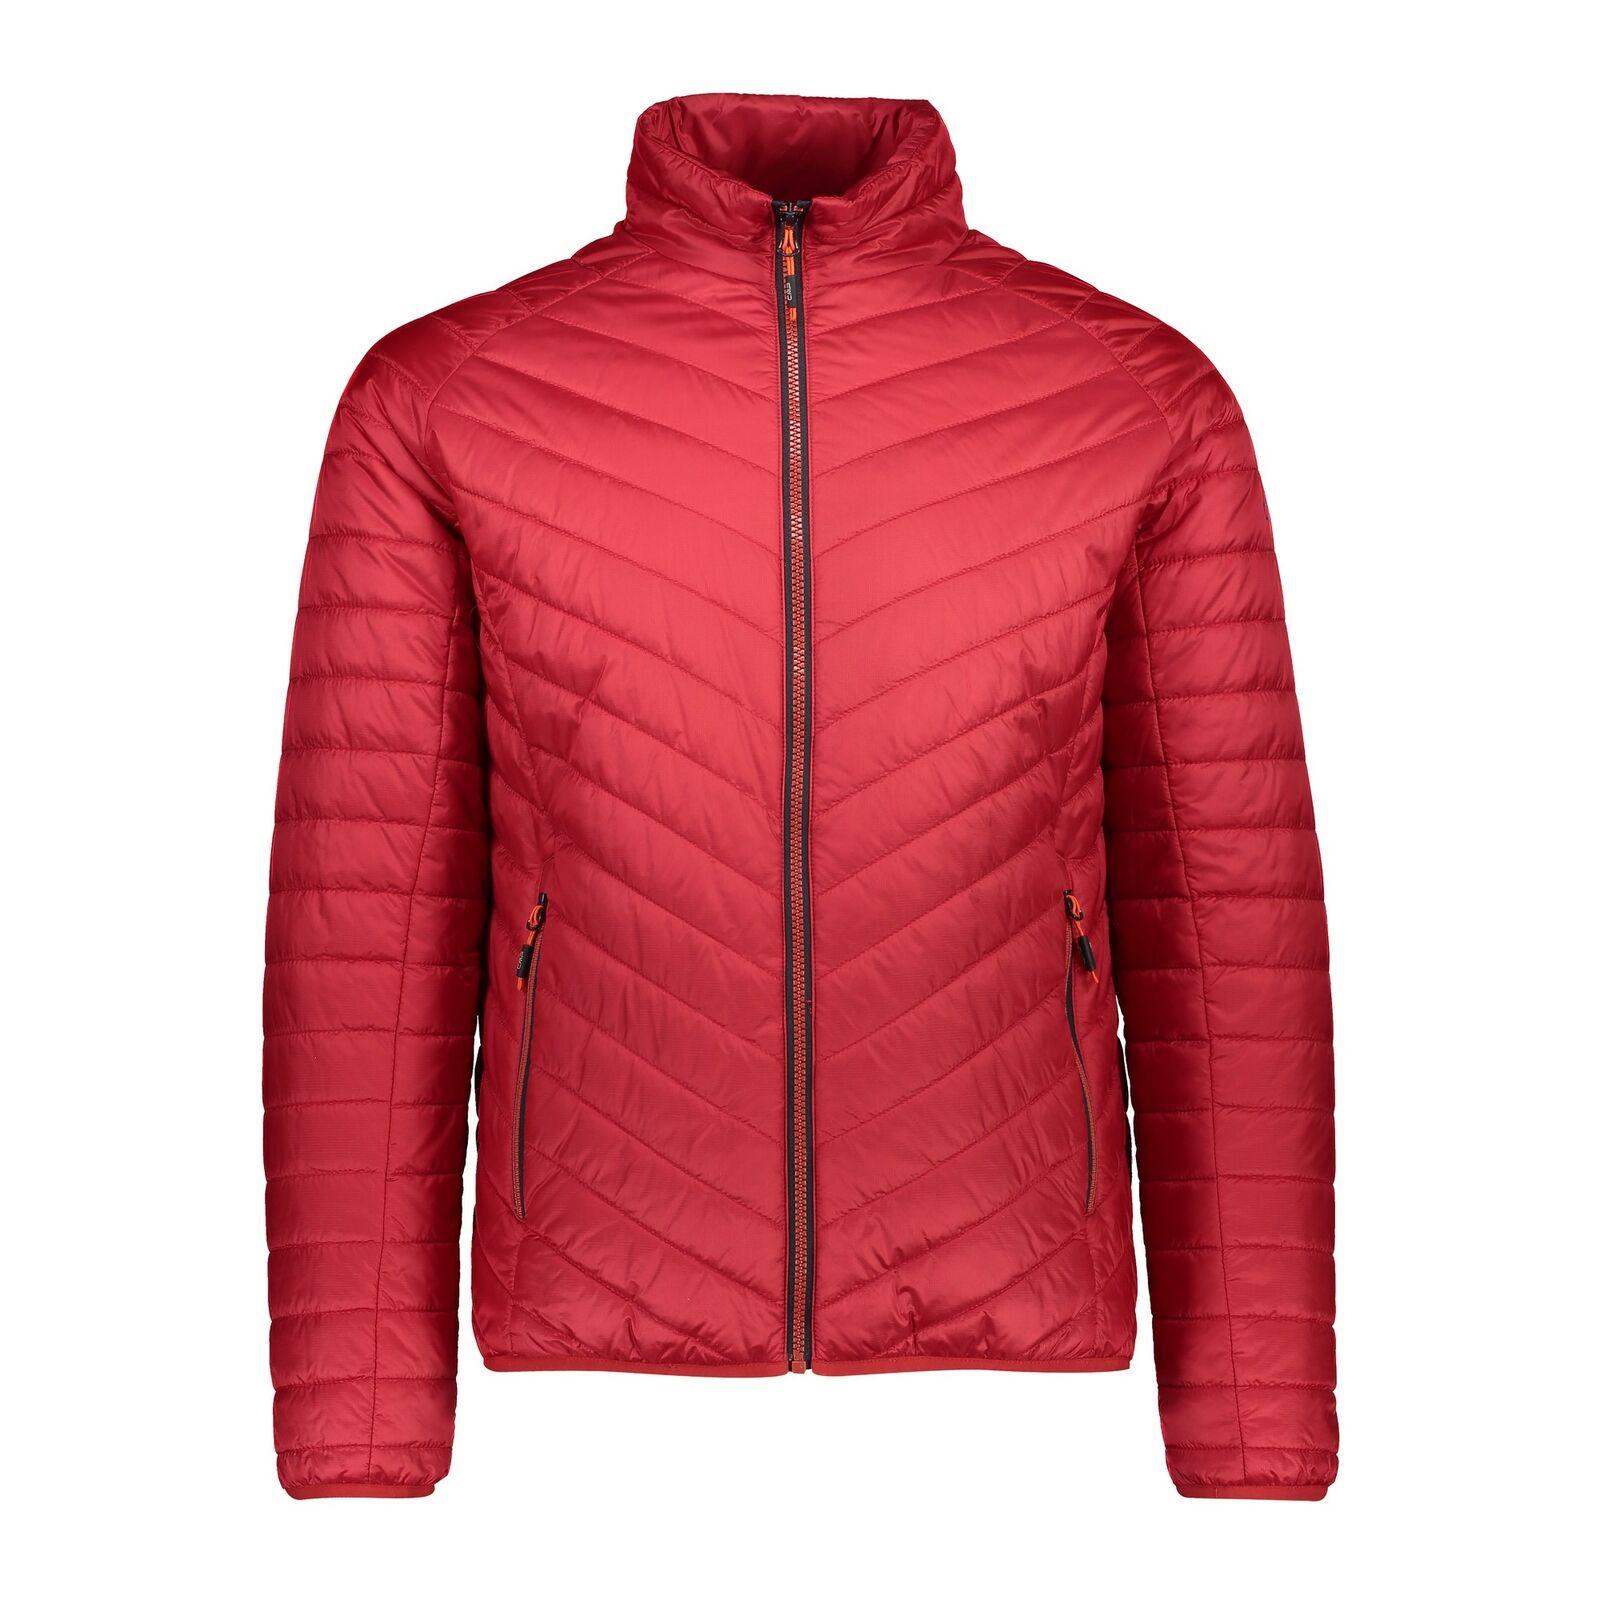 CMP Chaqueta para Exterior  Man Rojo Impermeable Transpirable Ligero  tienda de venta